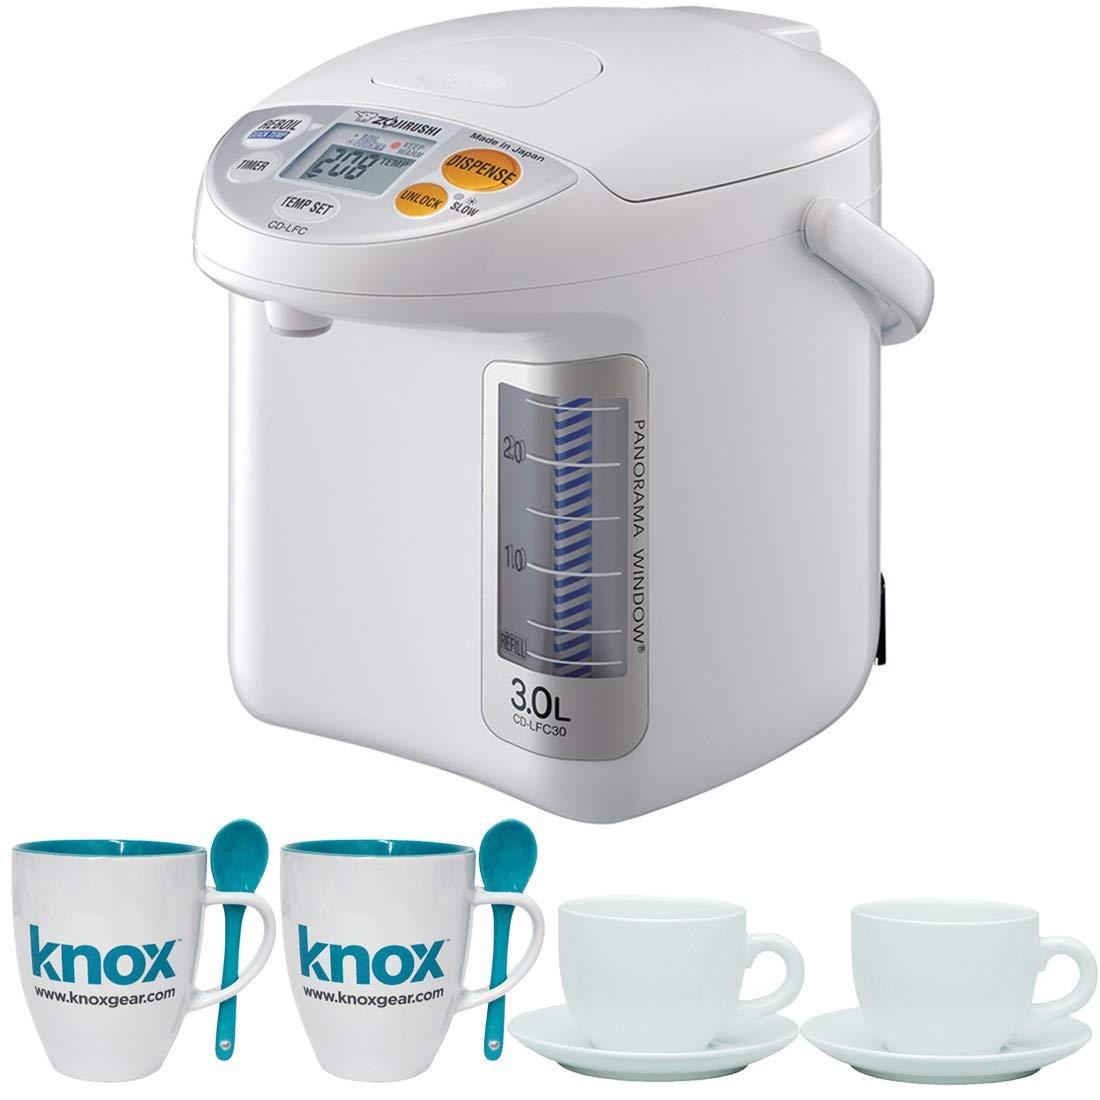 Zojirushi CD-LFC30 Panorama Window Micom Water Boiler and Warmer, 101 oz/3.0 L, White Includes 2 Espresso Cups and 2 Mugs Bundle by Zojirushi